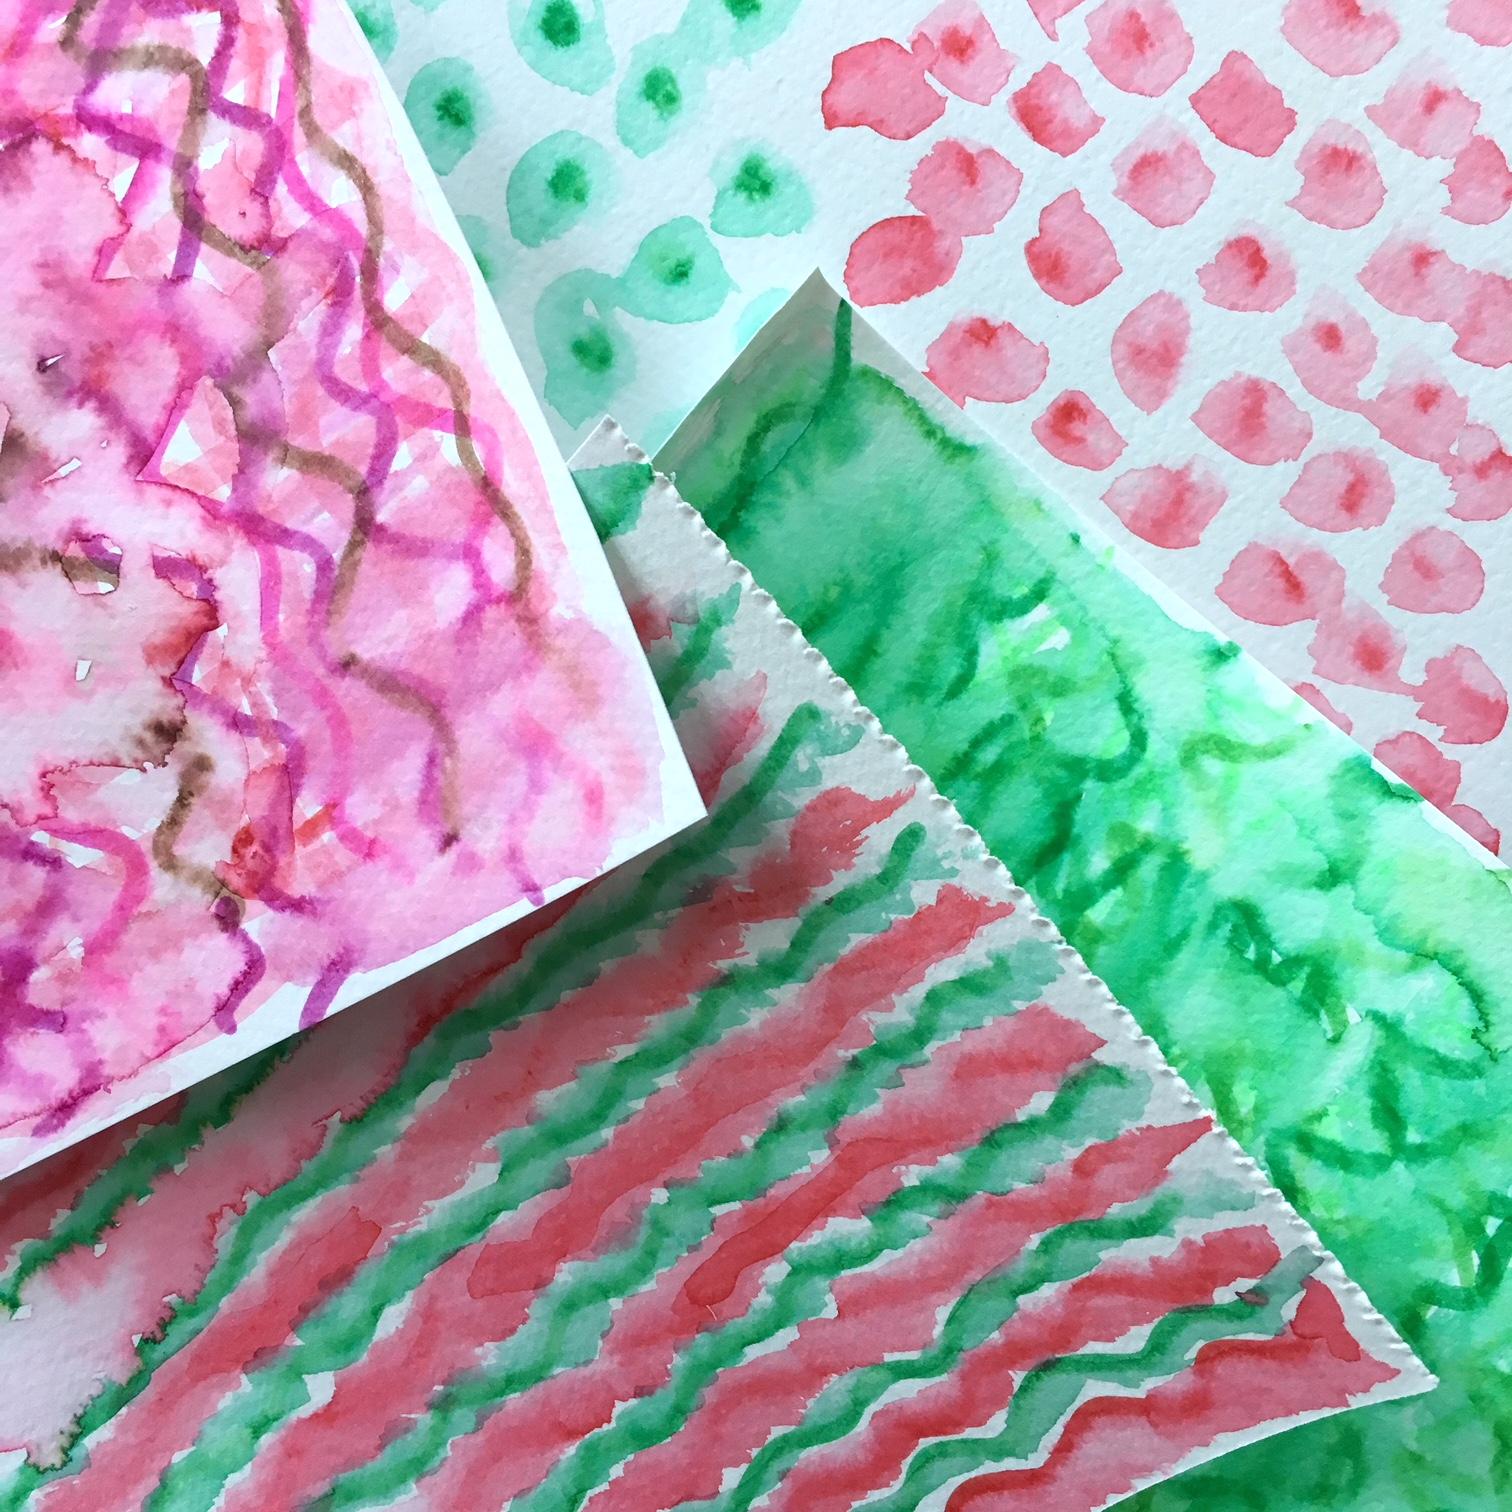 watercolour paper with watercolour drawn patterns